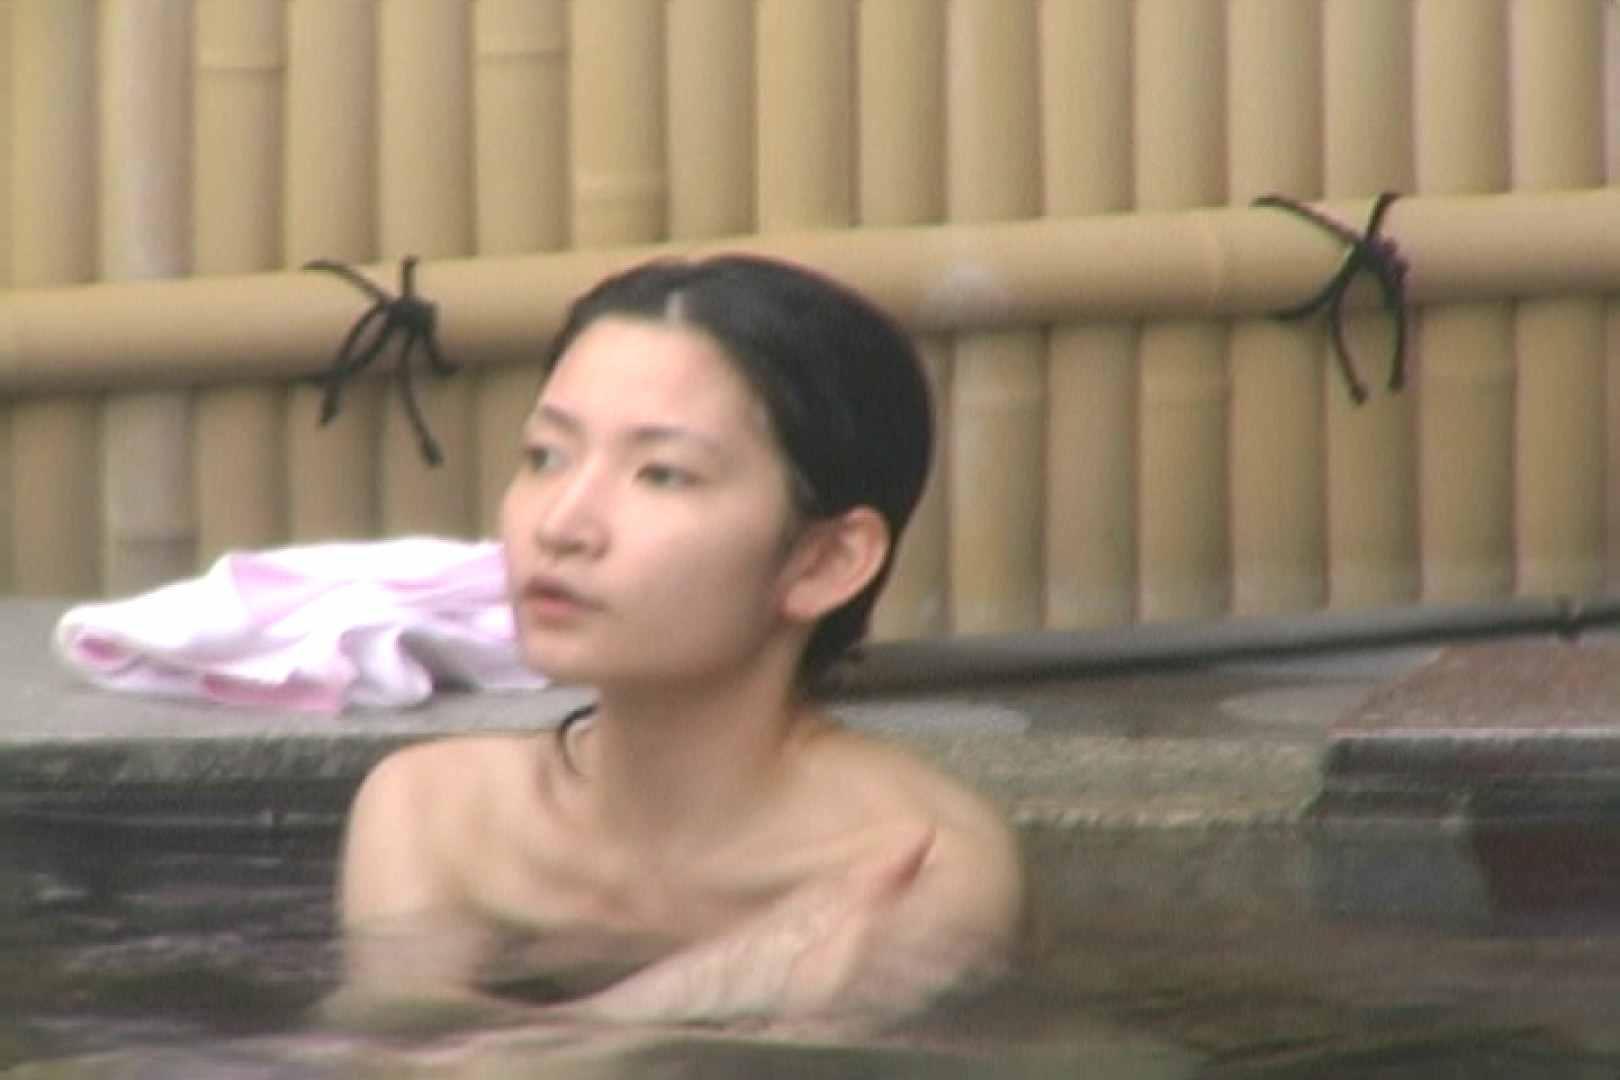 Aquaな露天風呂Vol.637 盗撮シリーズ | 露天風呂編  87PIX 1